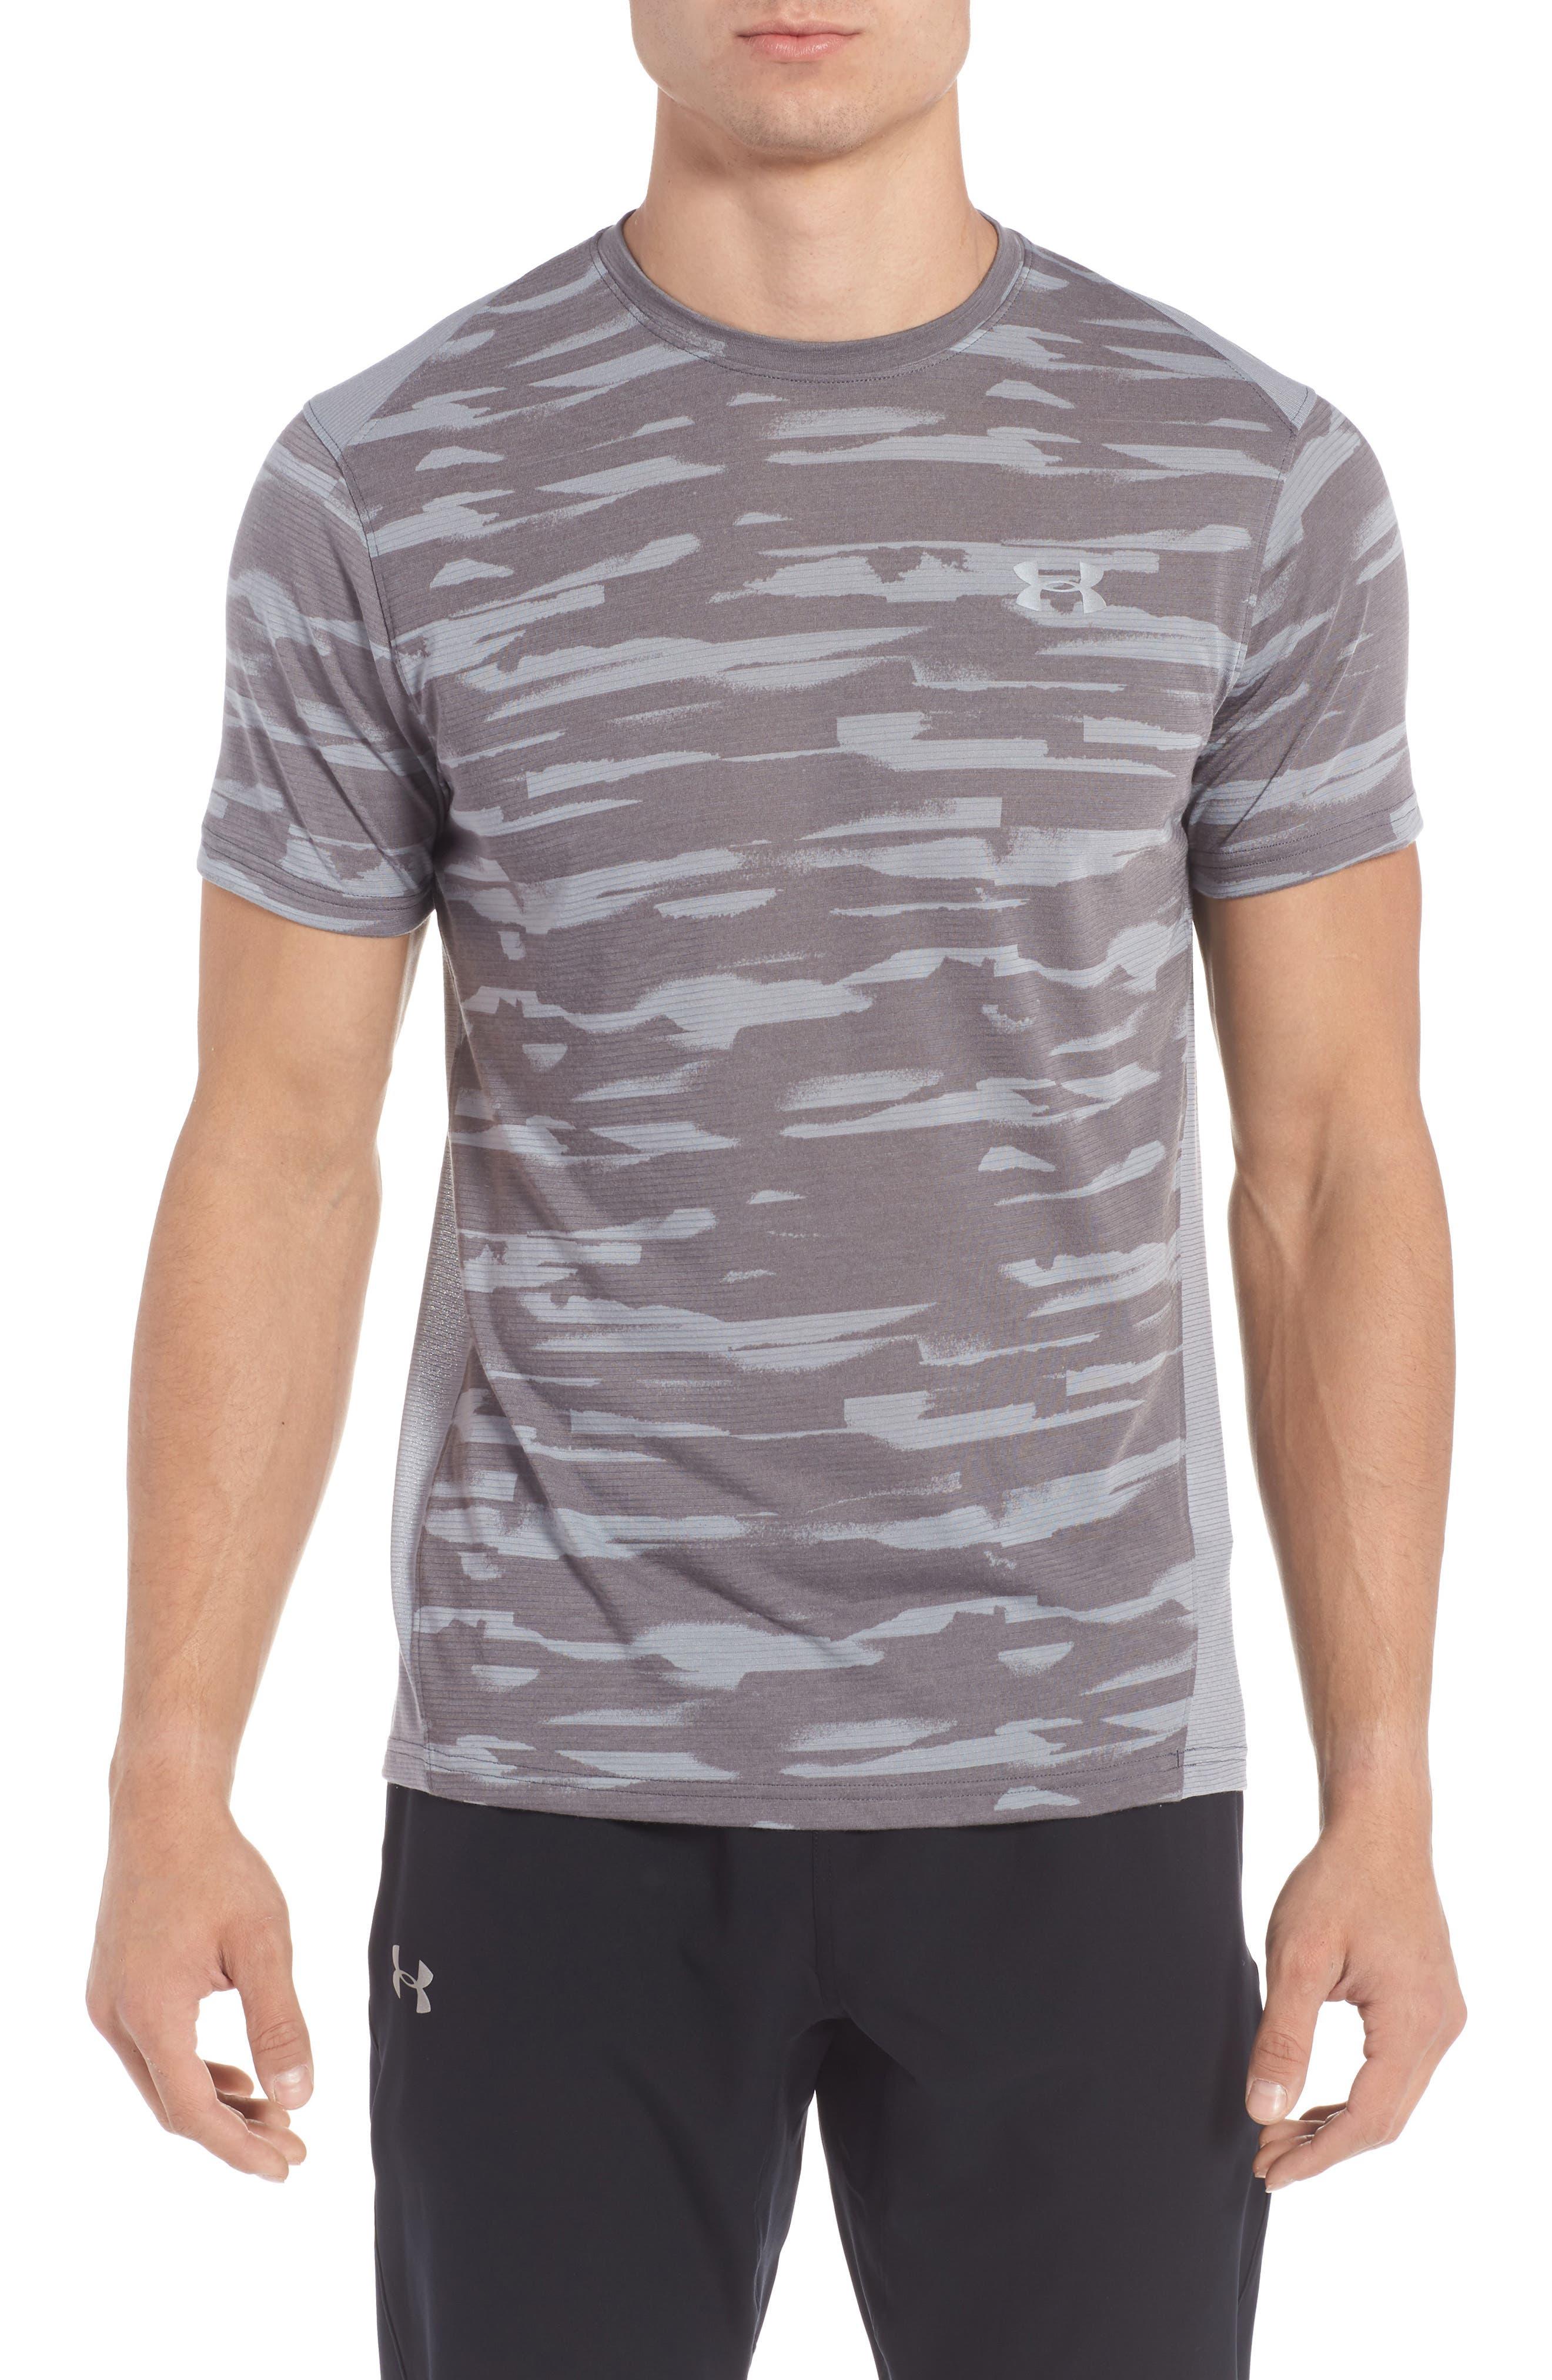 Threadborne Mesh Running T-Shirt,                         Main,                         color, Grey / Black / Reflective